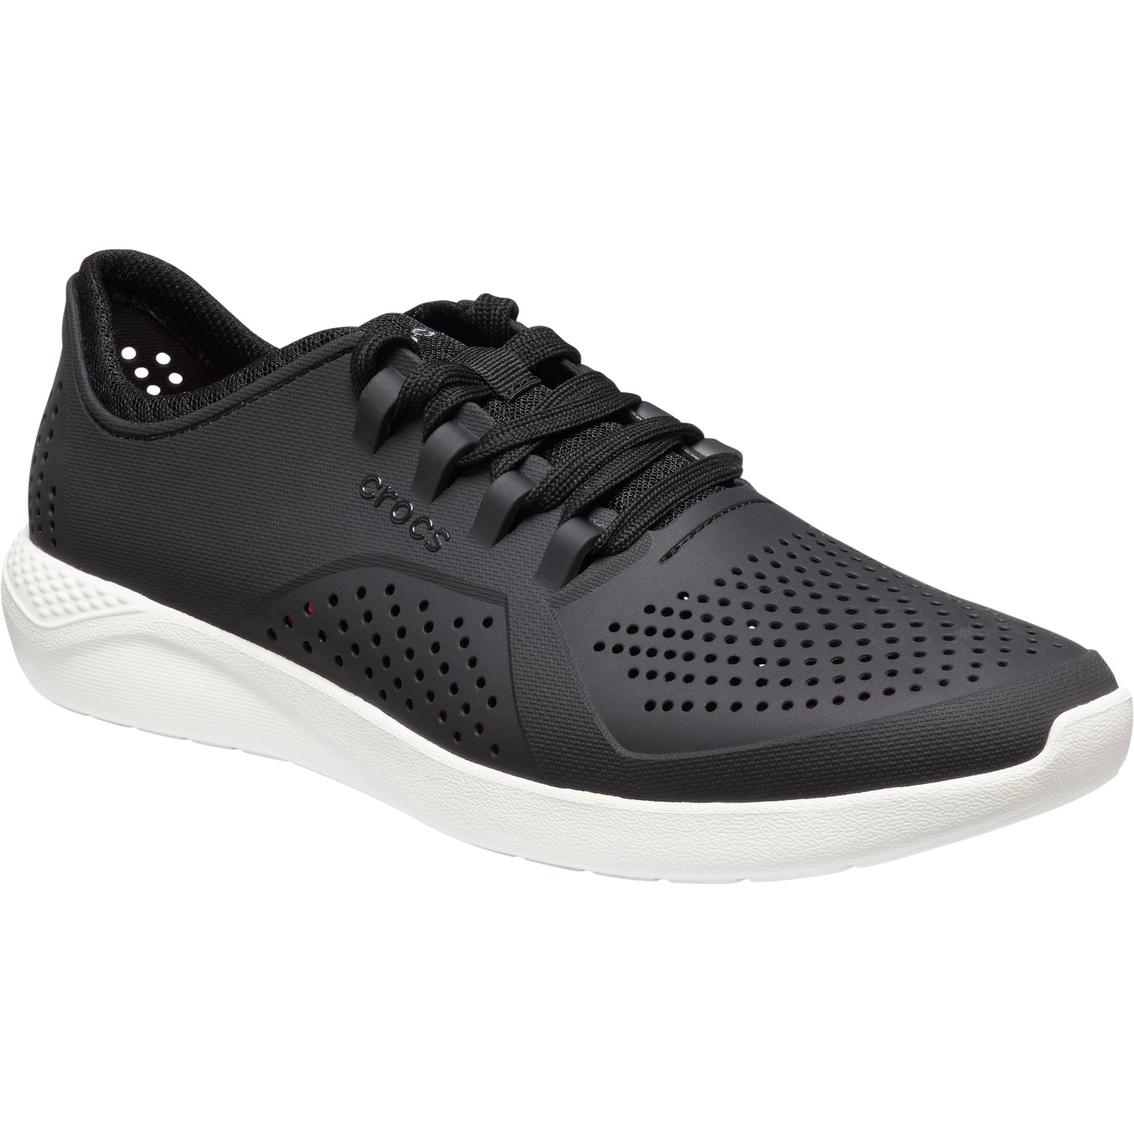 f897fcfd7dc80 Crocs Men s Literide Pacer Sneakers